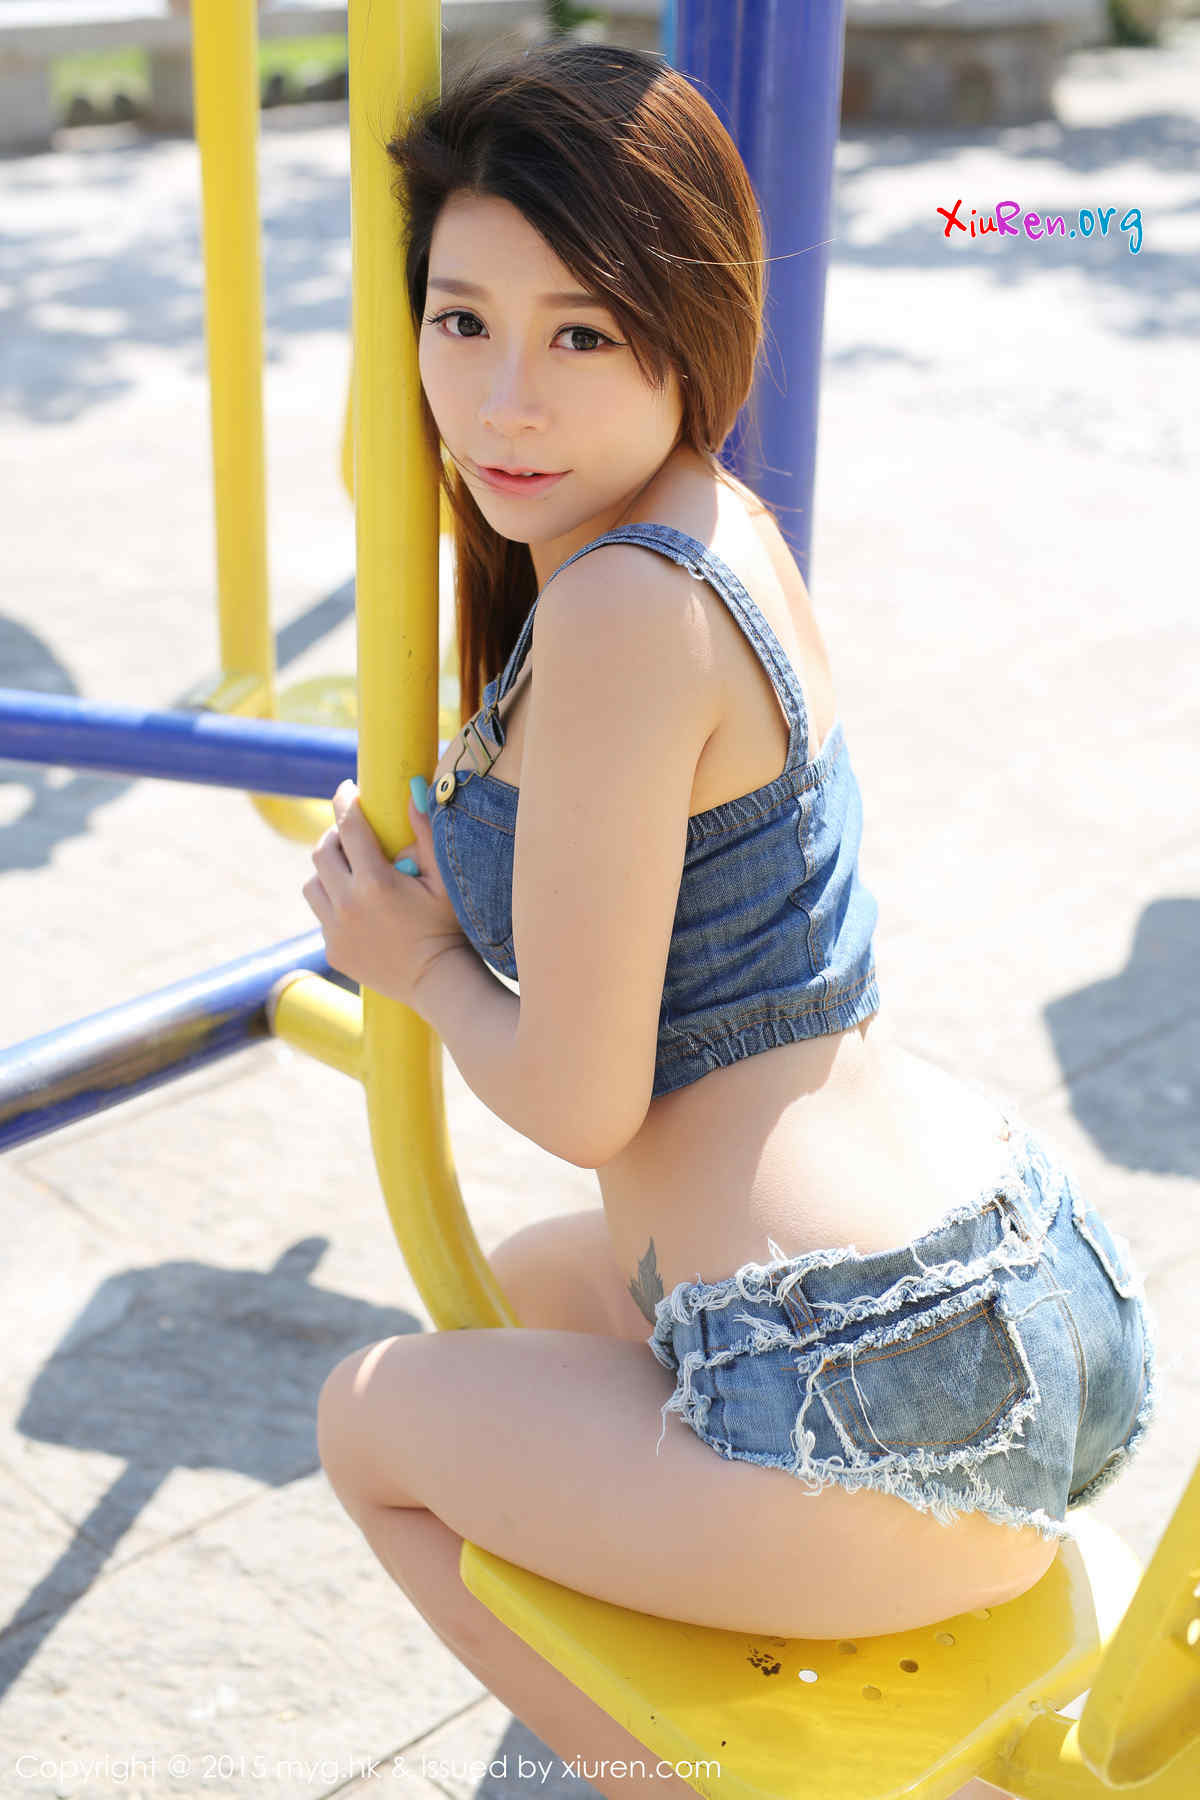 PhimVu-Blog-0044.jpg